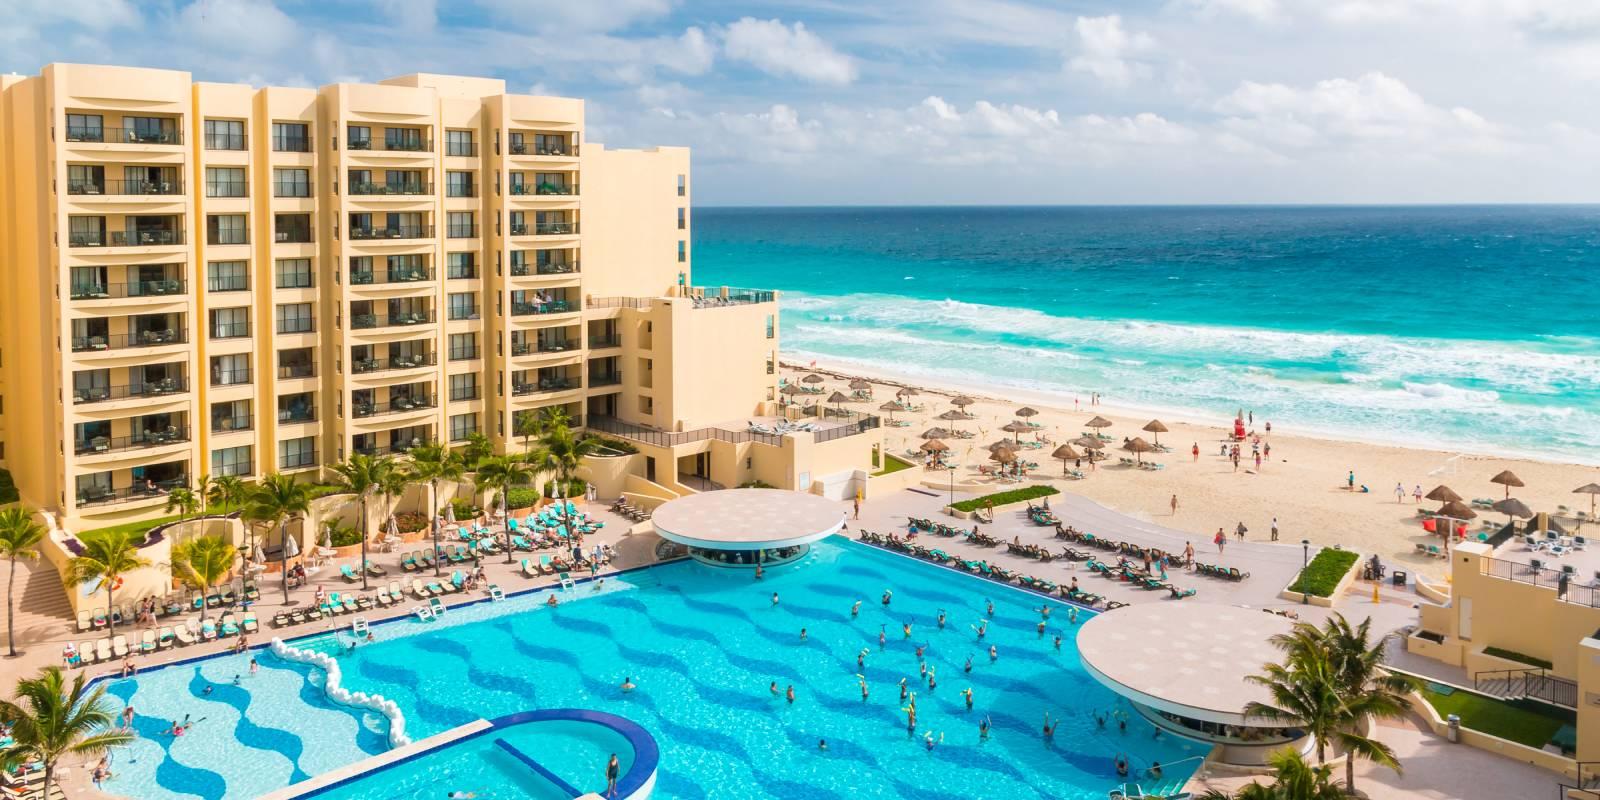 Grand Luxe Destinations - Beaches